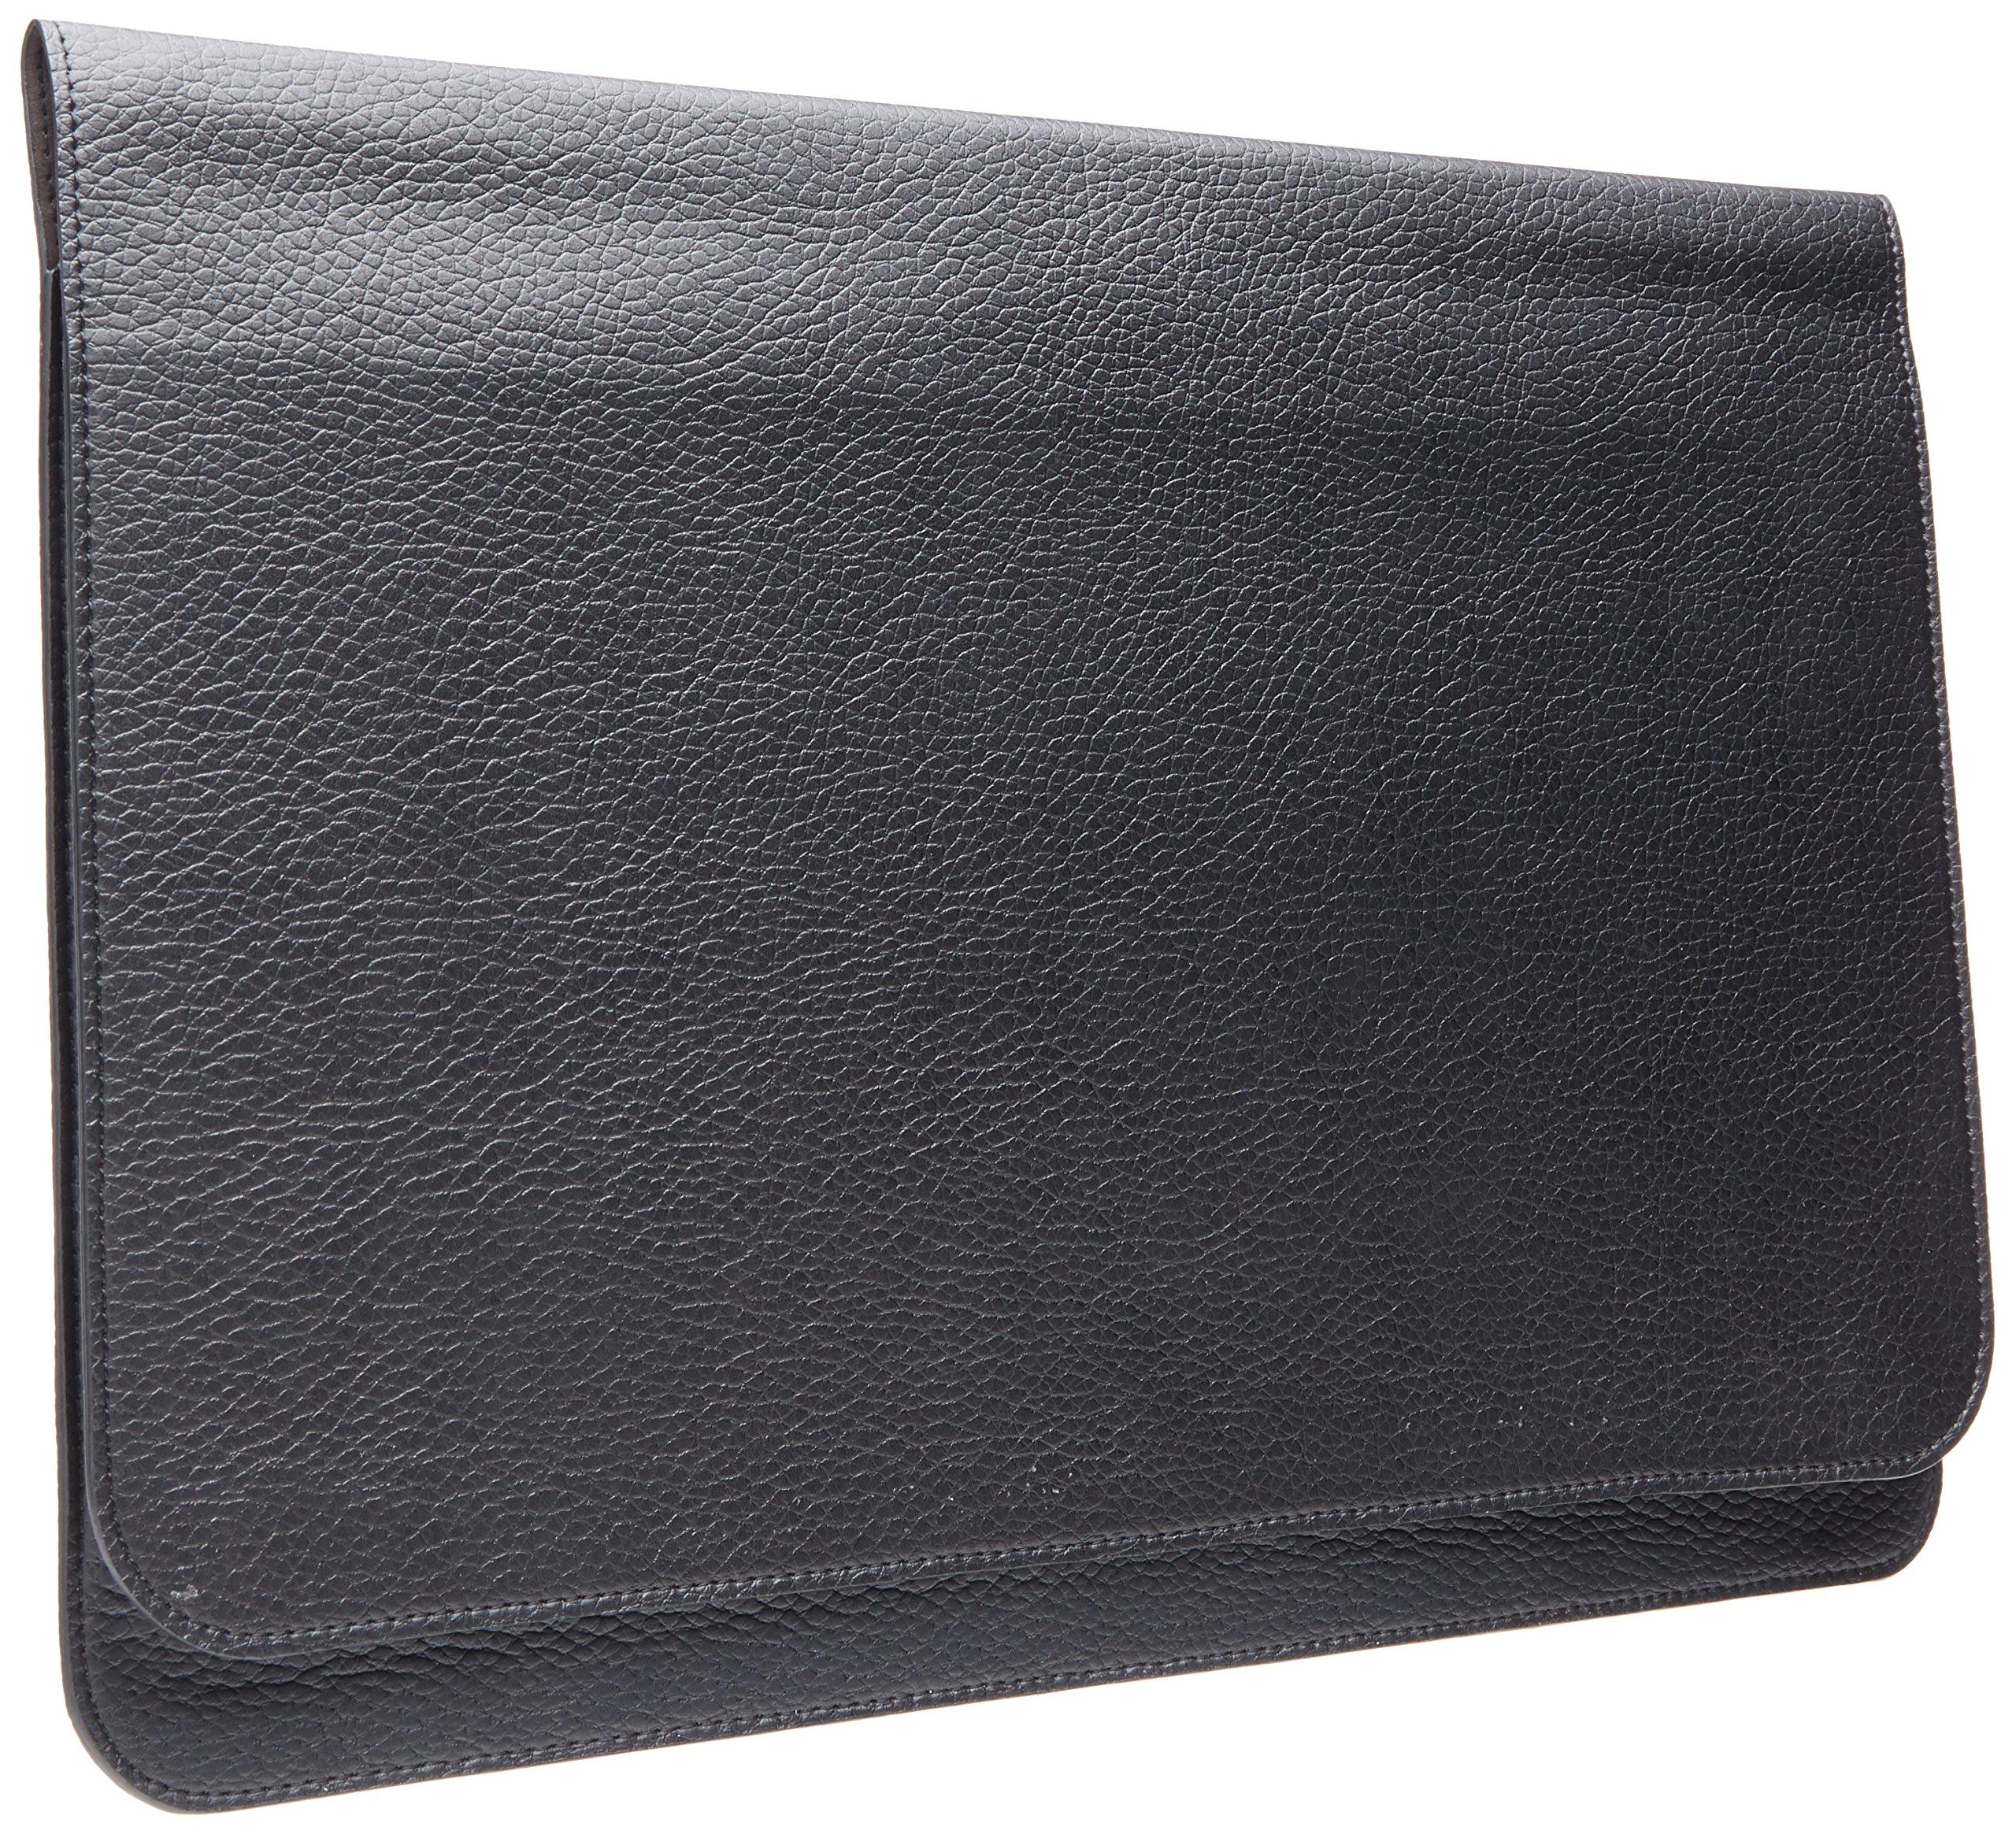 Samsung Slim Pouch for 13-Inch ATIV Book 7/9 - Black (AA-BS8N13B/US)